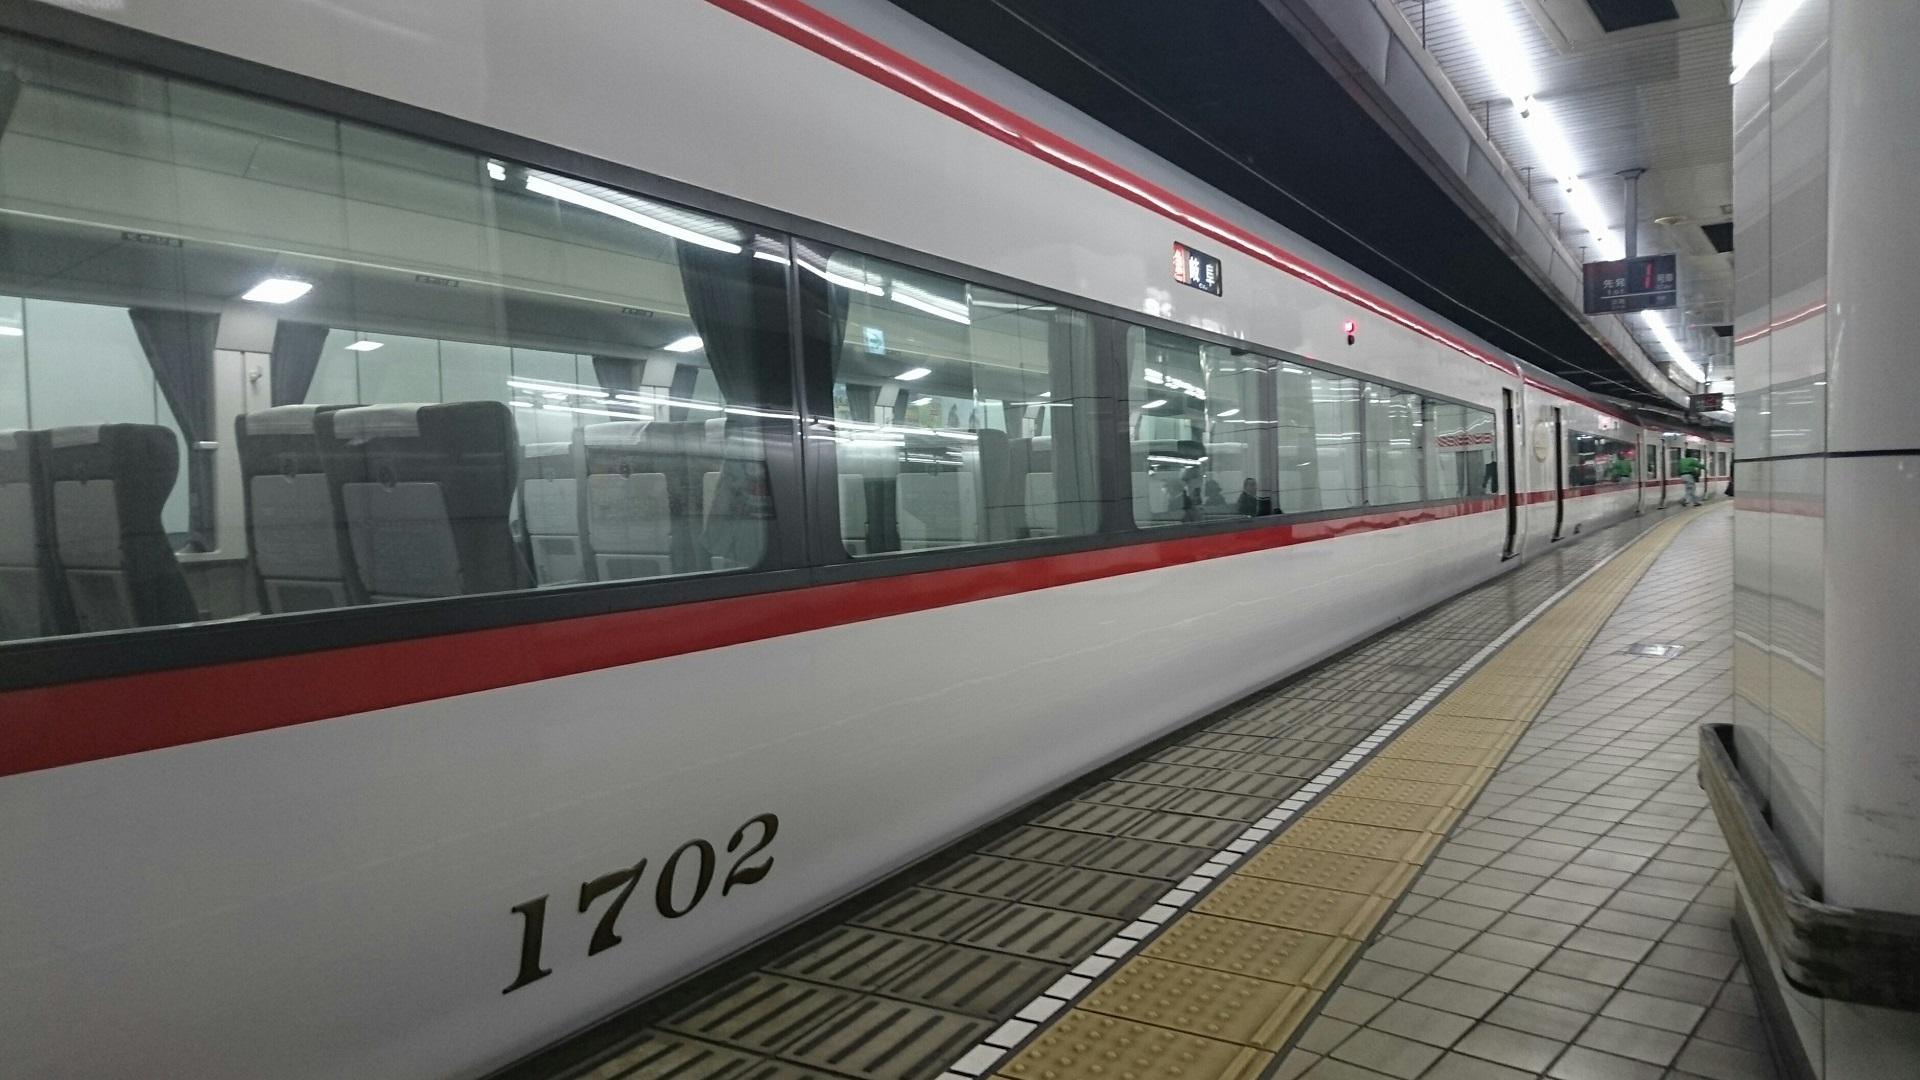 2018.4.5 名古屋 (14) 名古屋 - 岐阜いき特急 1920-1080